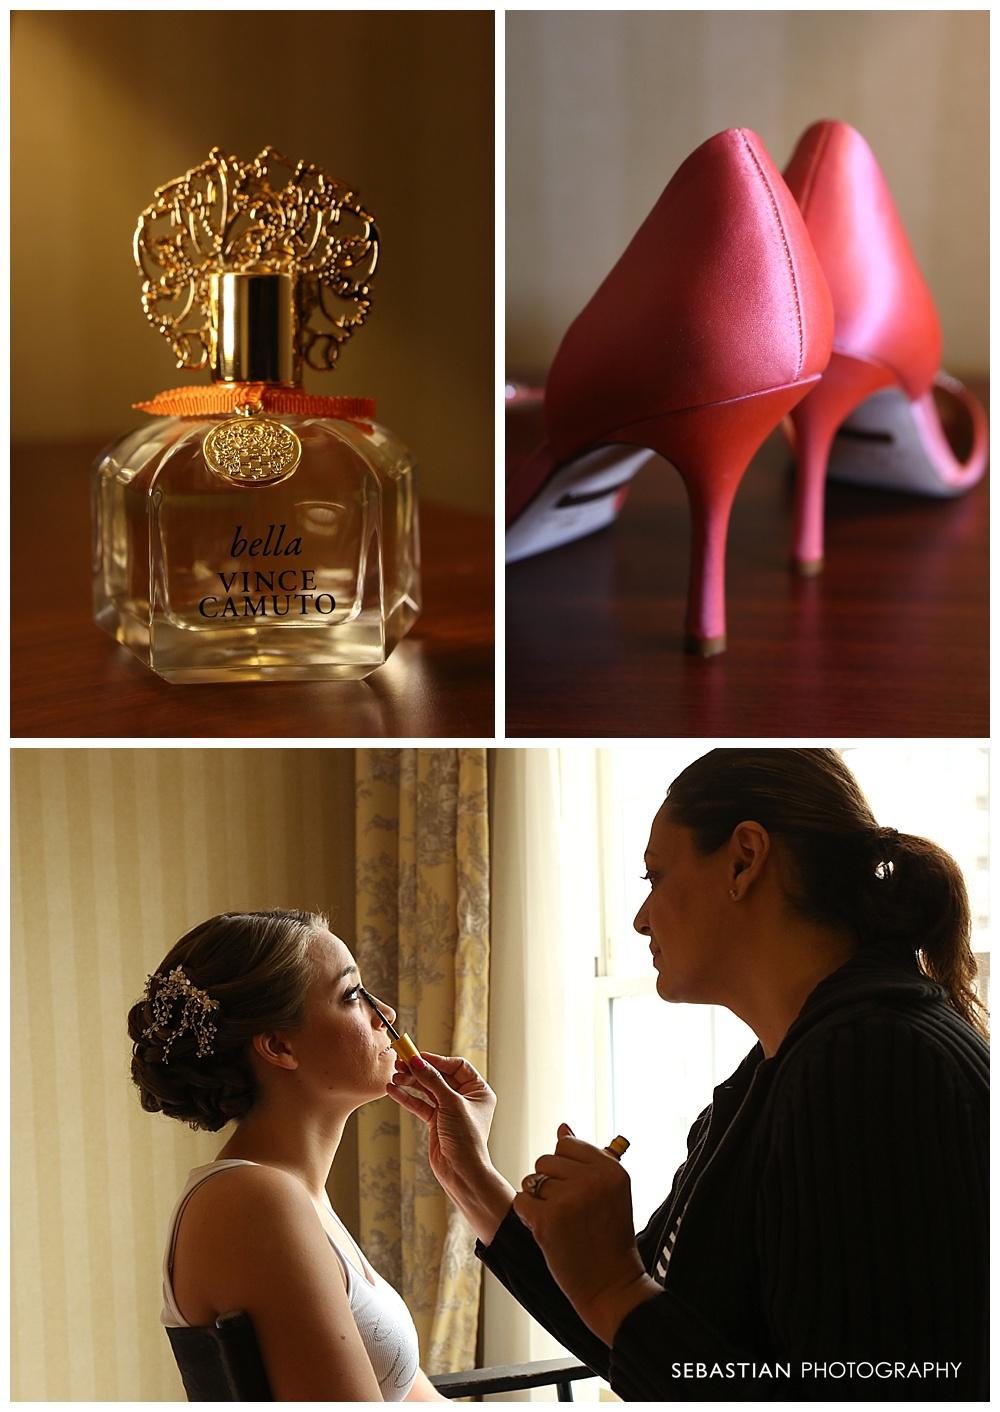 Sebastian_Photography_StClements_Portland_CT_Wedding_Pictures_01.jpg